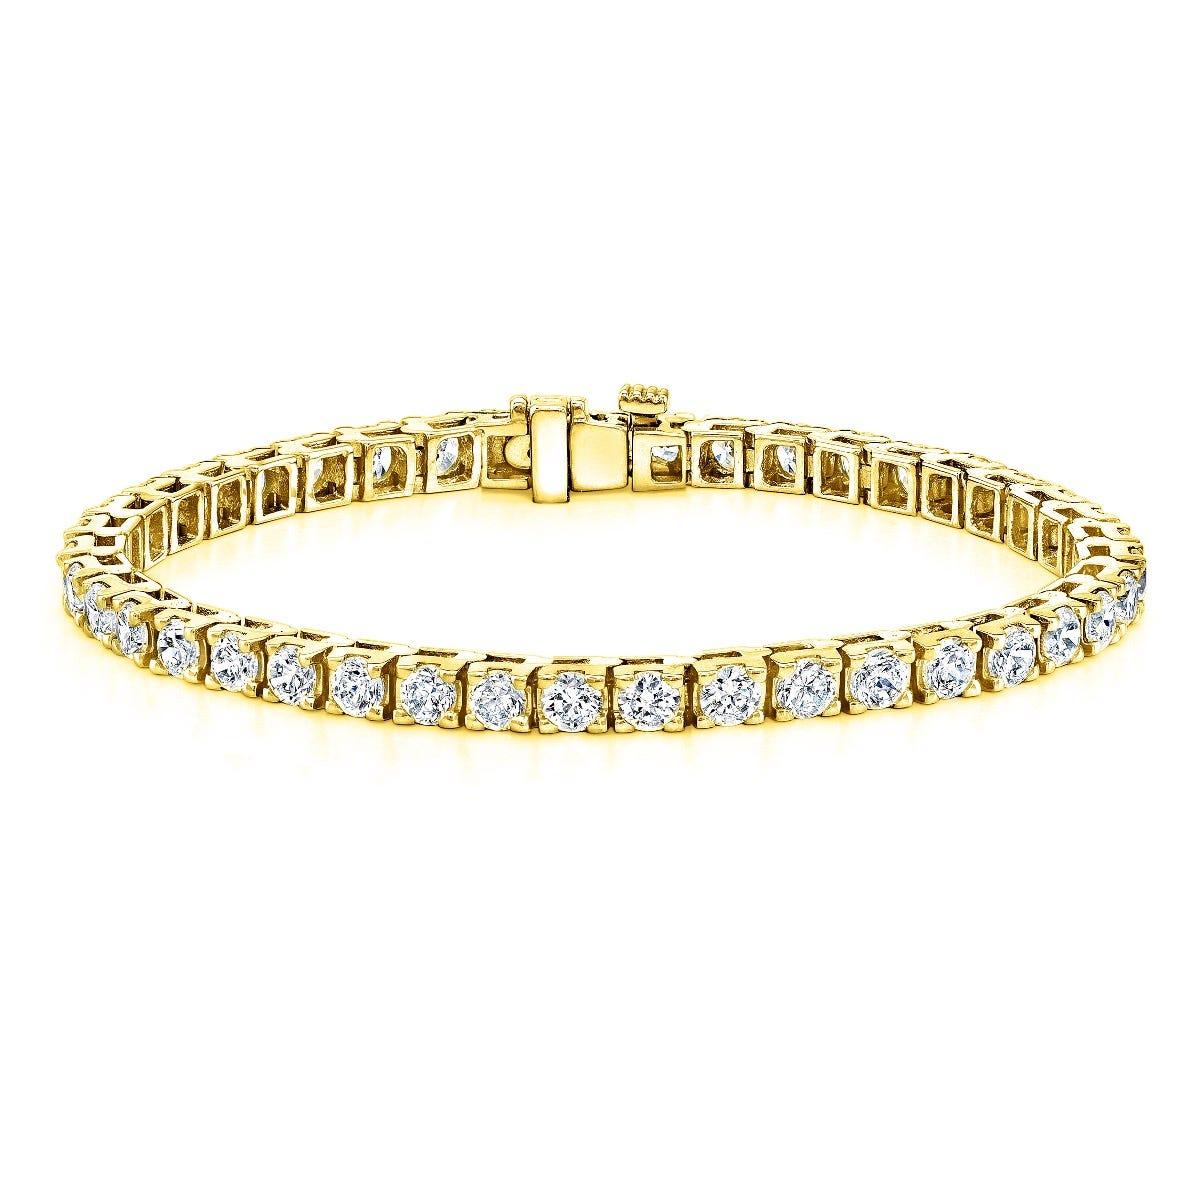 9ctw. 4-Prong Square Link Diamond Tennis Bracelet in 14K Yellow Gold (JK, I2-I3)